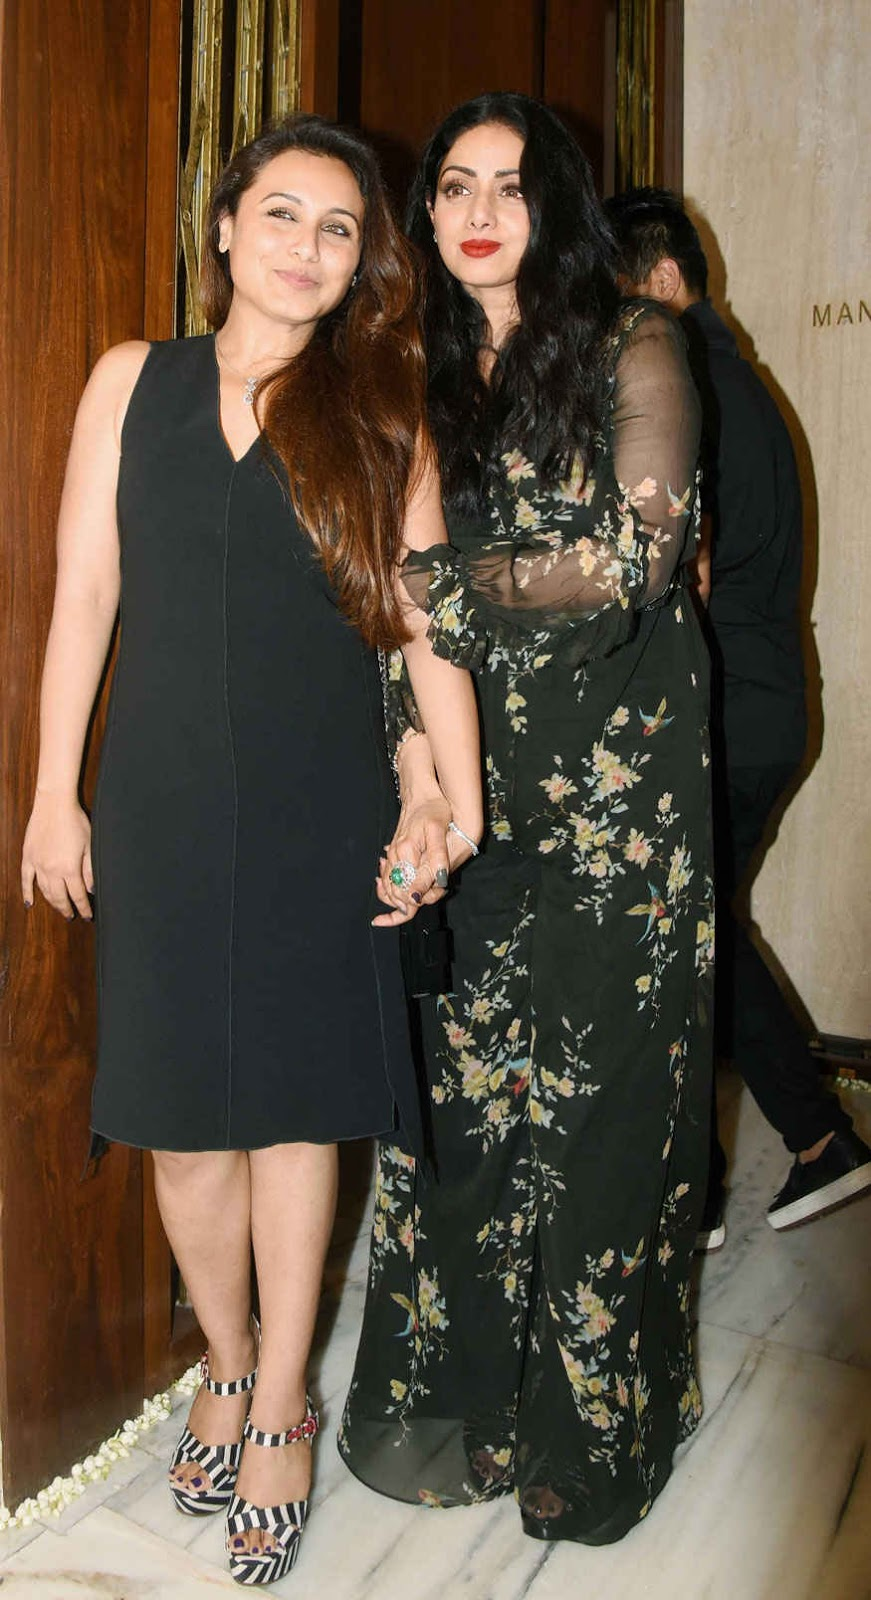 Aishwarya Rai Bachchan and Rani Mukerji at Sridevi's Birthday Celebration